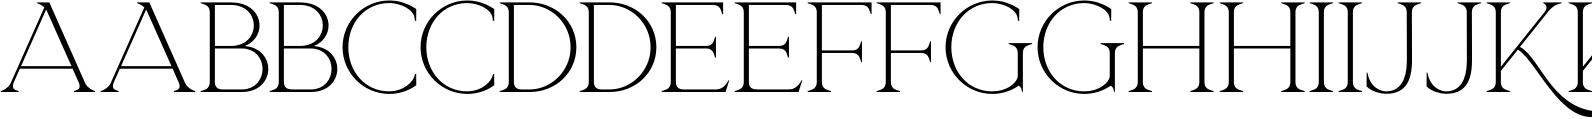 Georgia Ballpark Font Duo